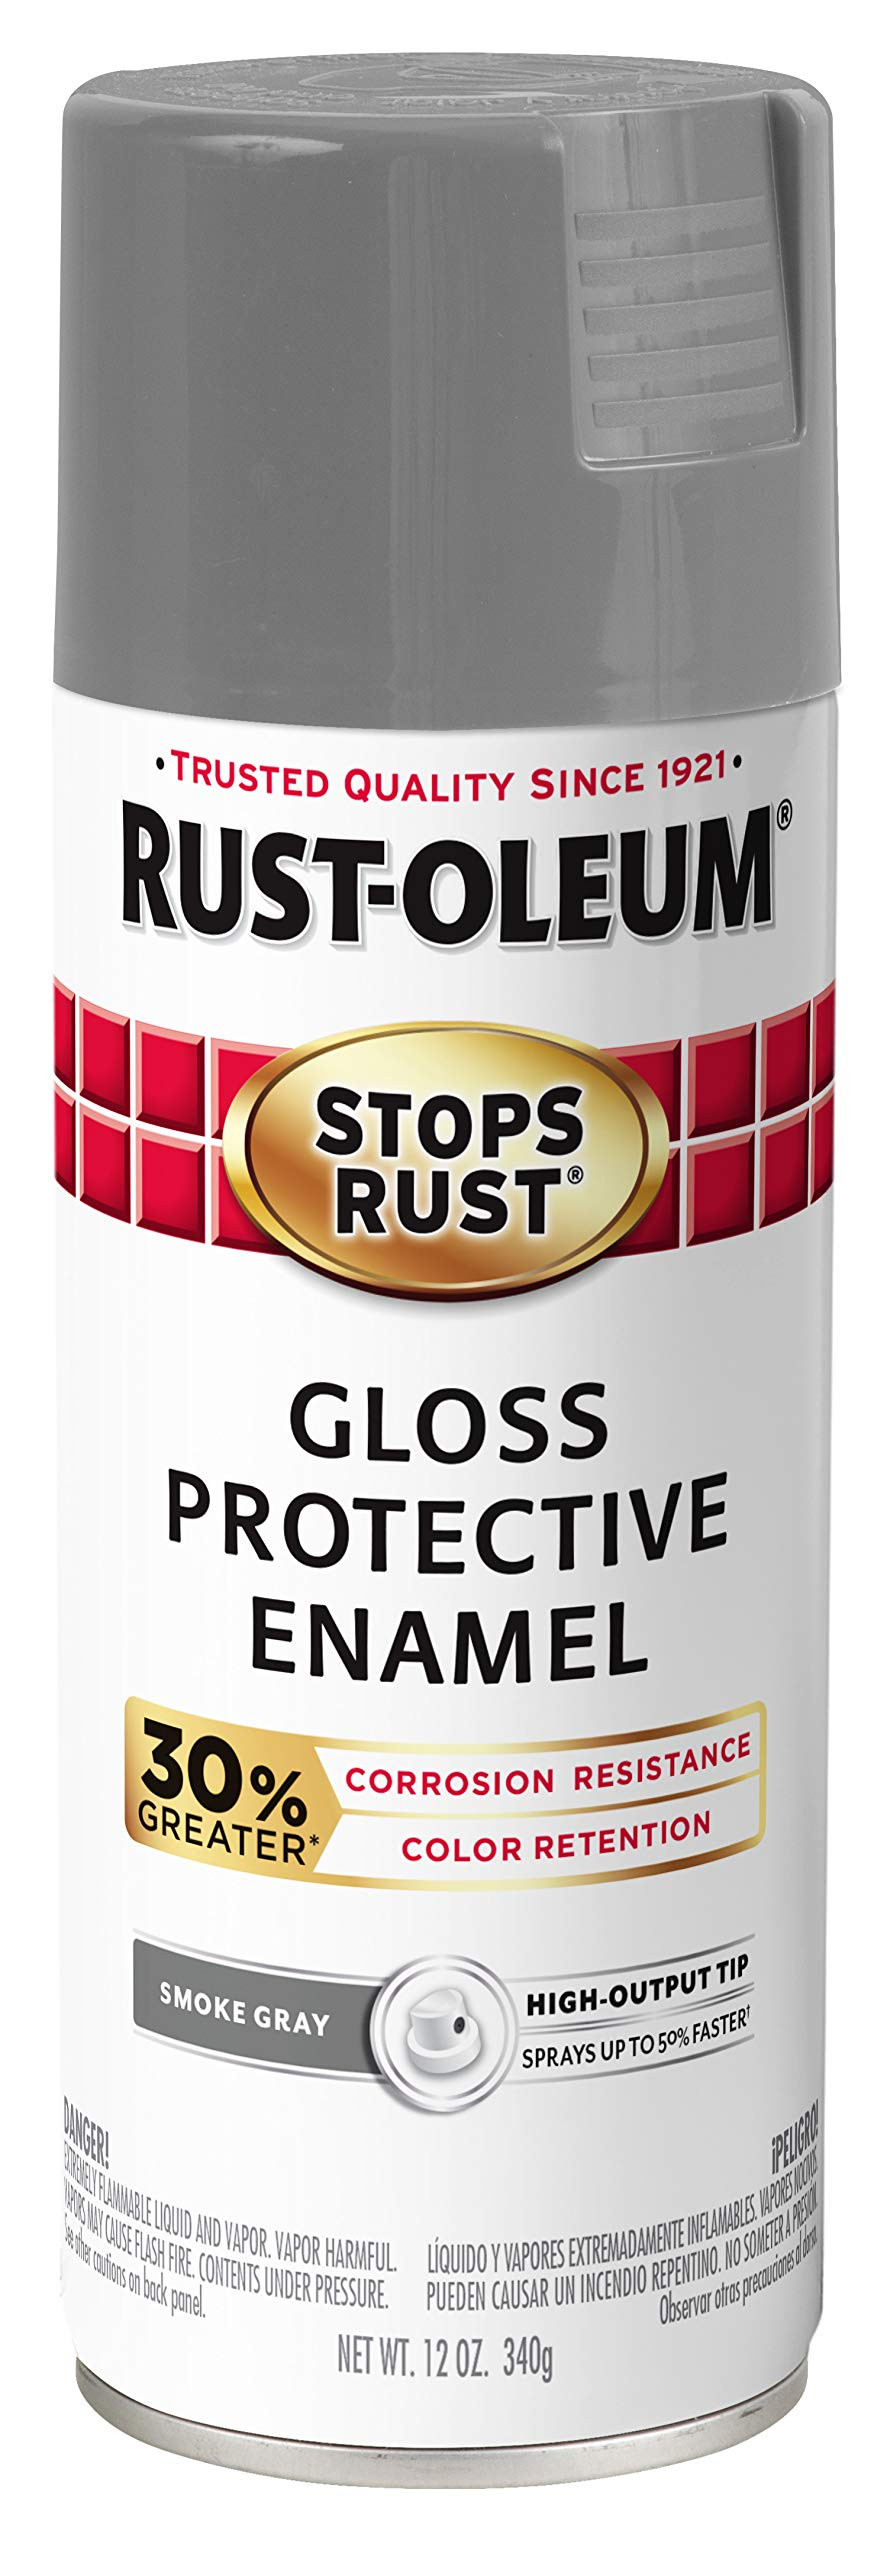 Rust-Oleum 338924-6PK Stops Rust Advanced Spray Paint, 12-Ounce, Gloss Smoke Gray, 6 Pack